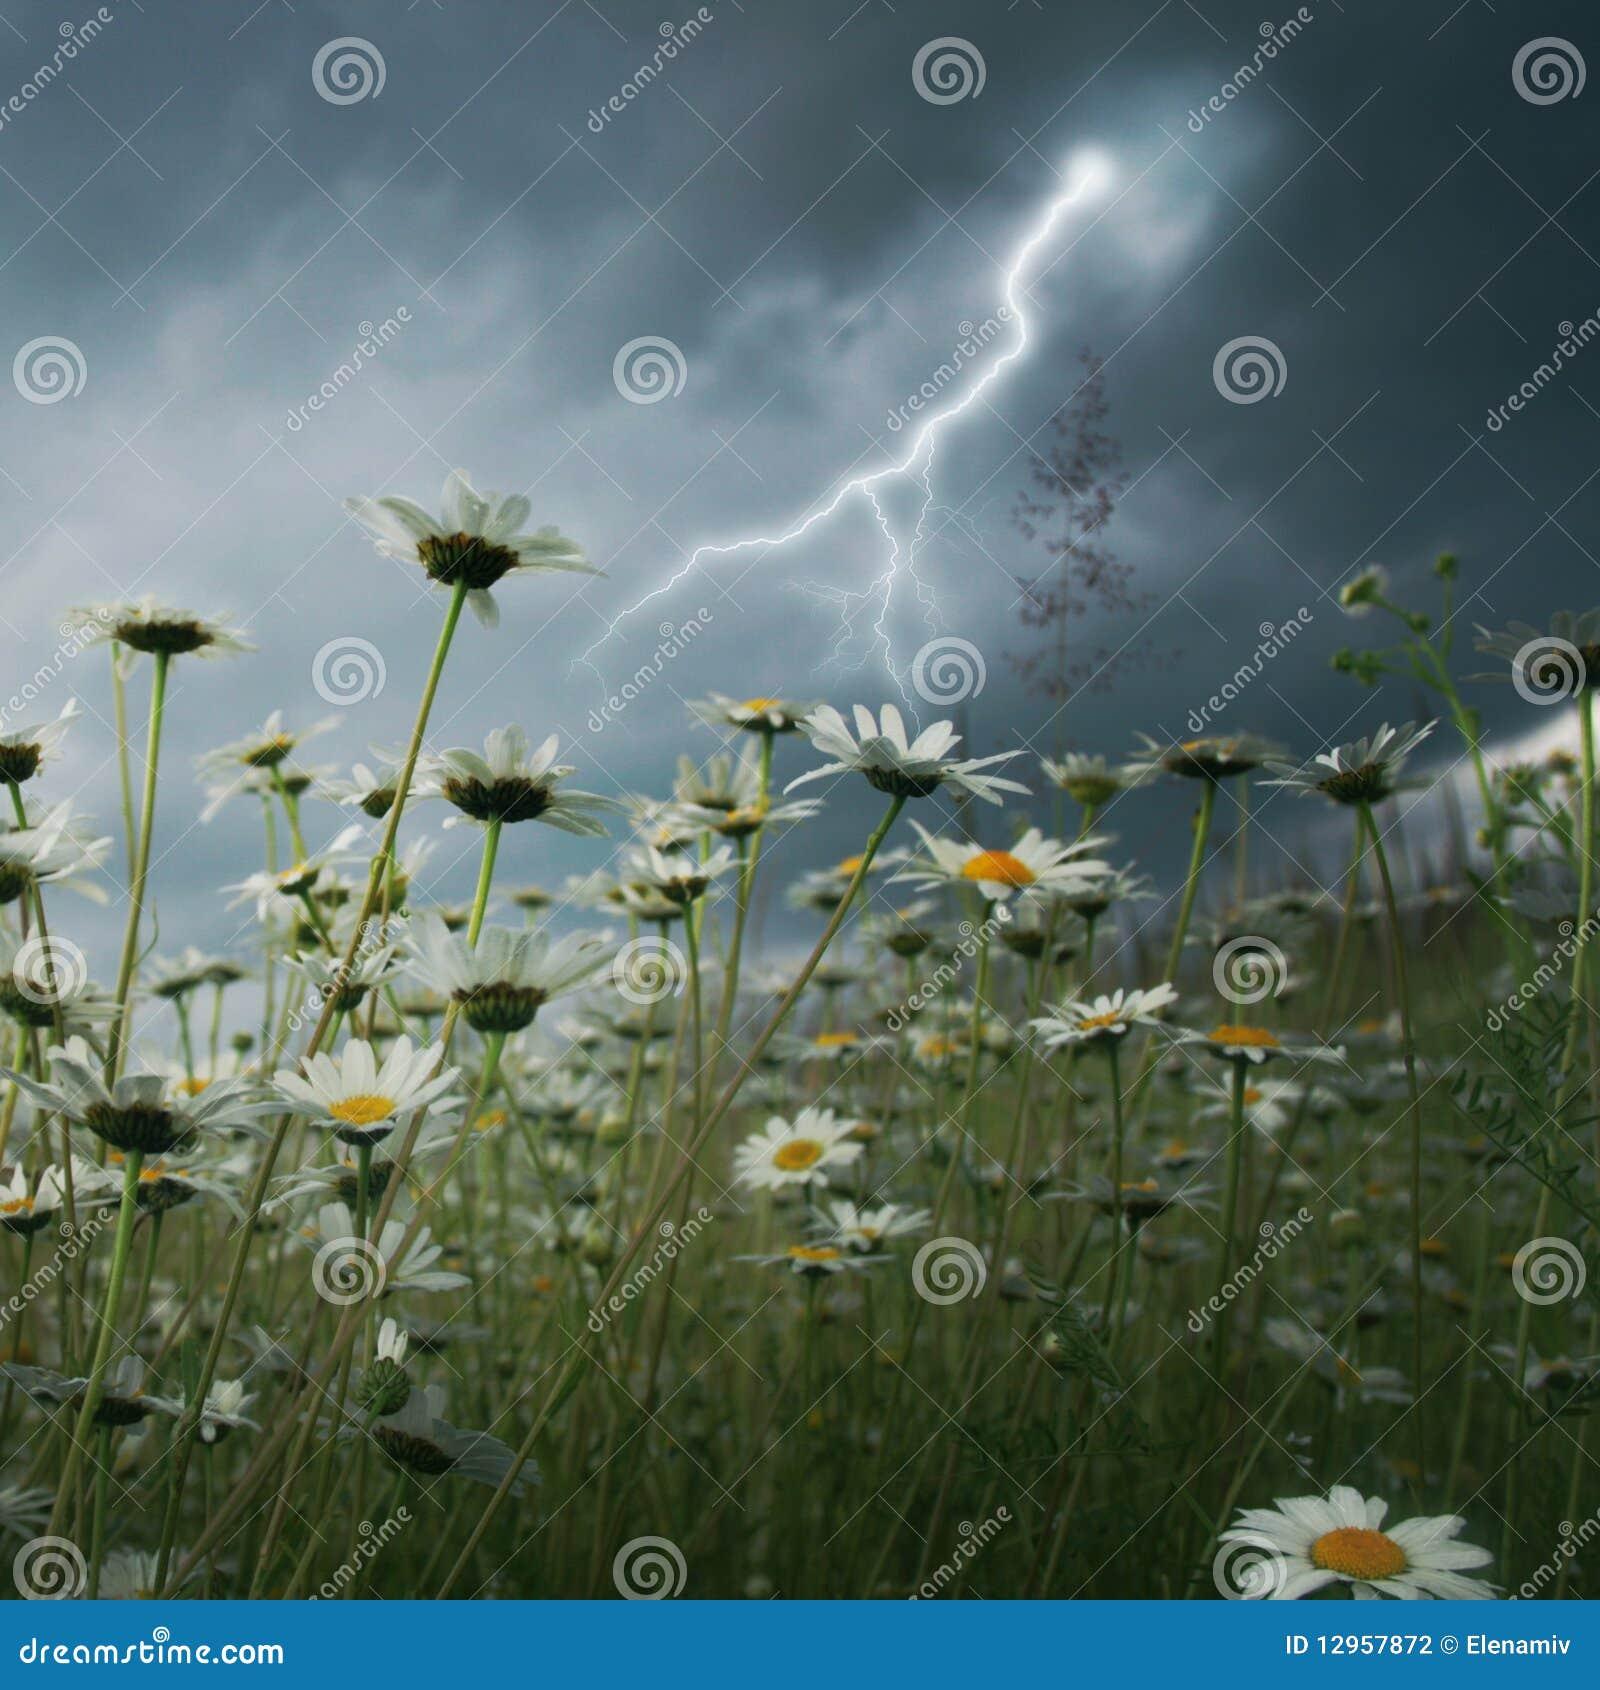 Blitzschlag über Feld.